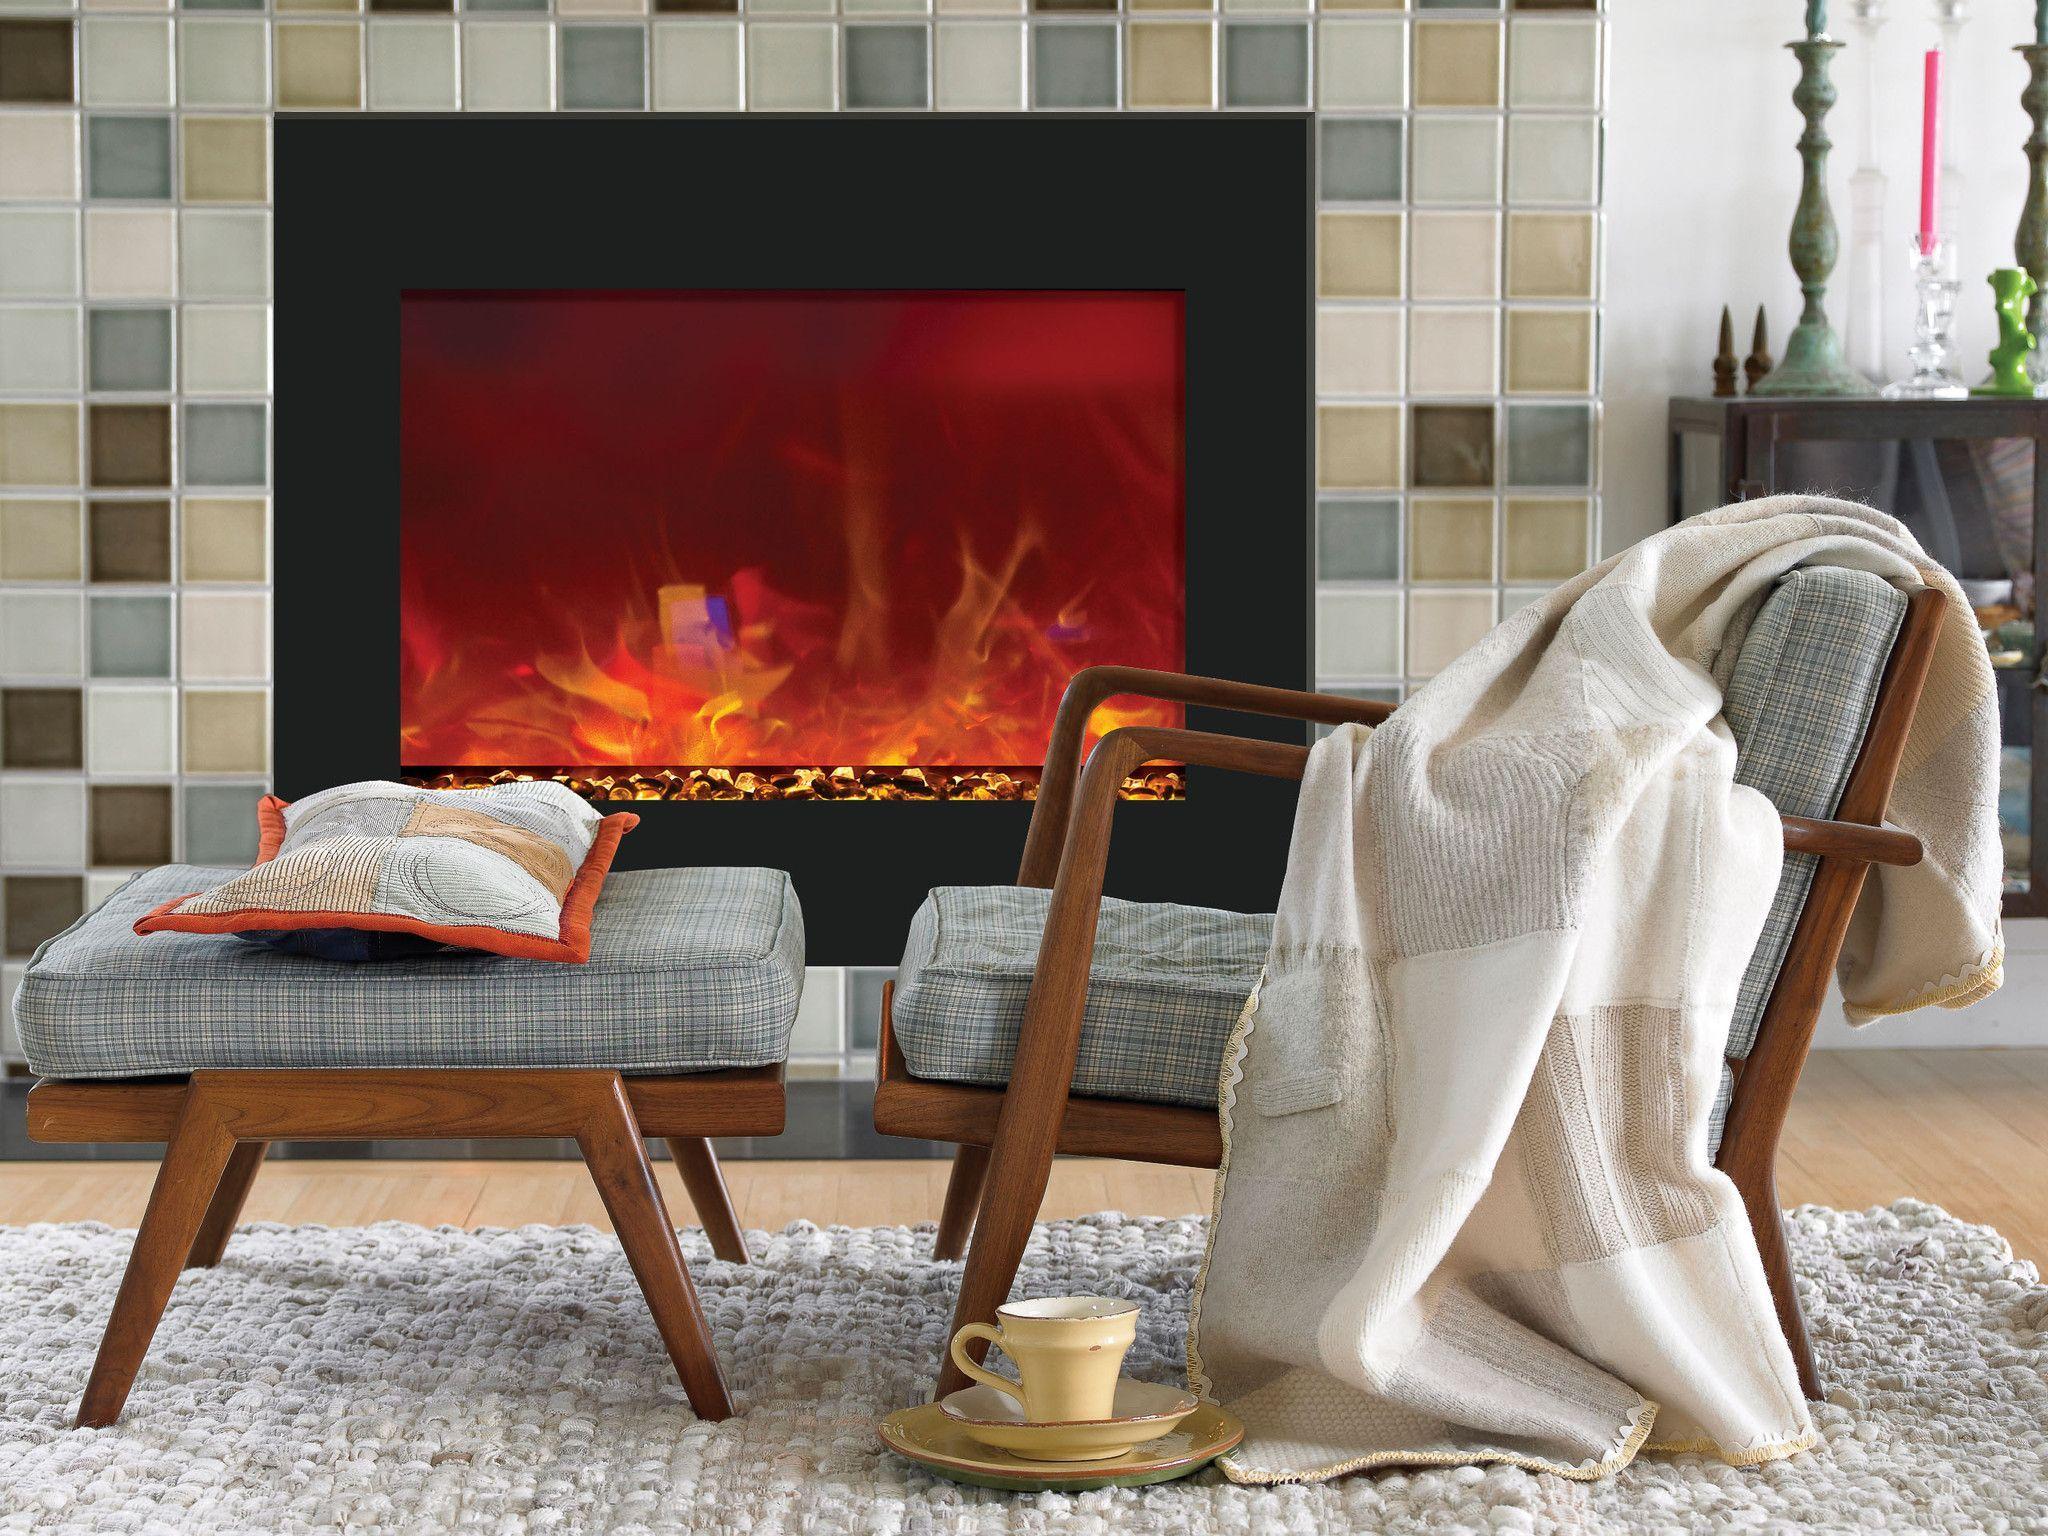 Amantii Built In Electric Fireplace Zecl 39 4134 Built In Electric Fireplace Electric Fireplace Fireplace